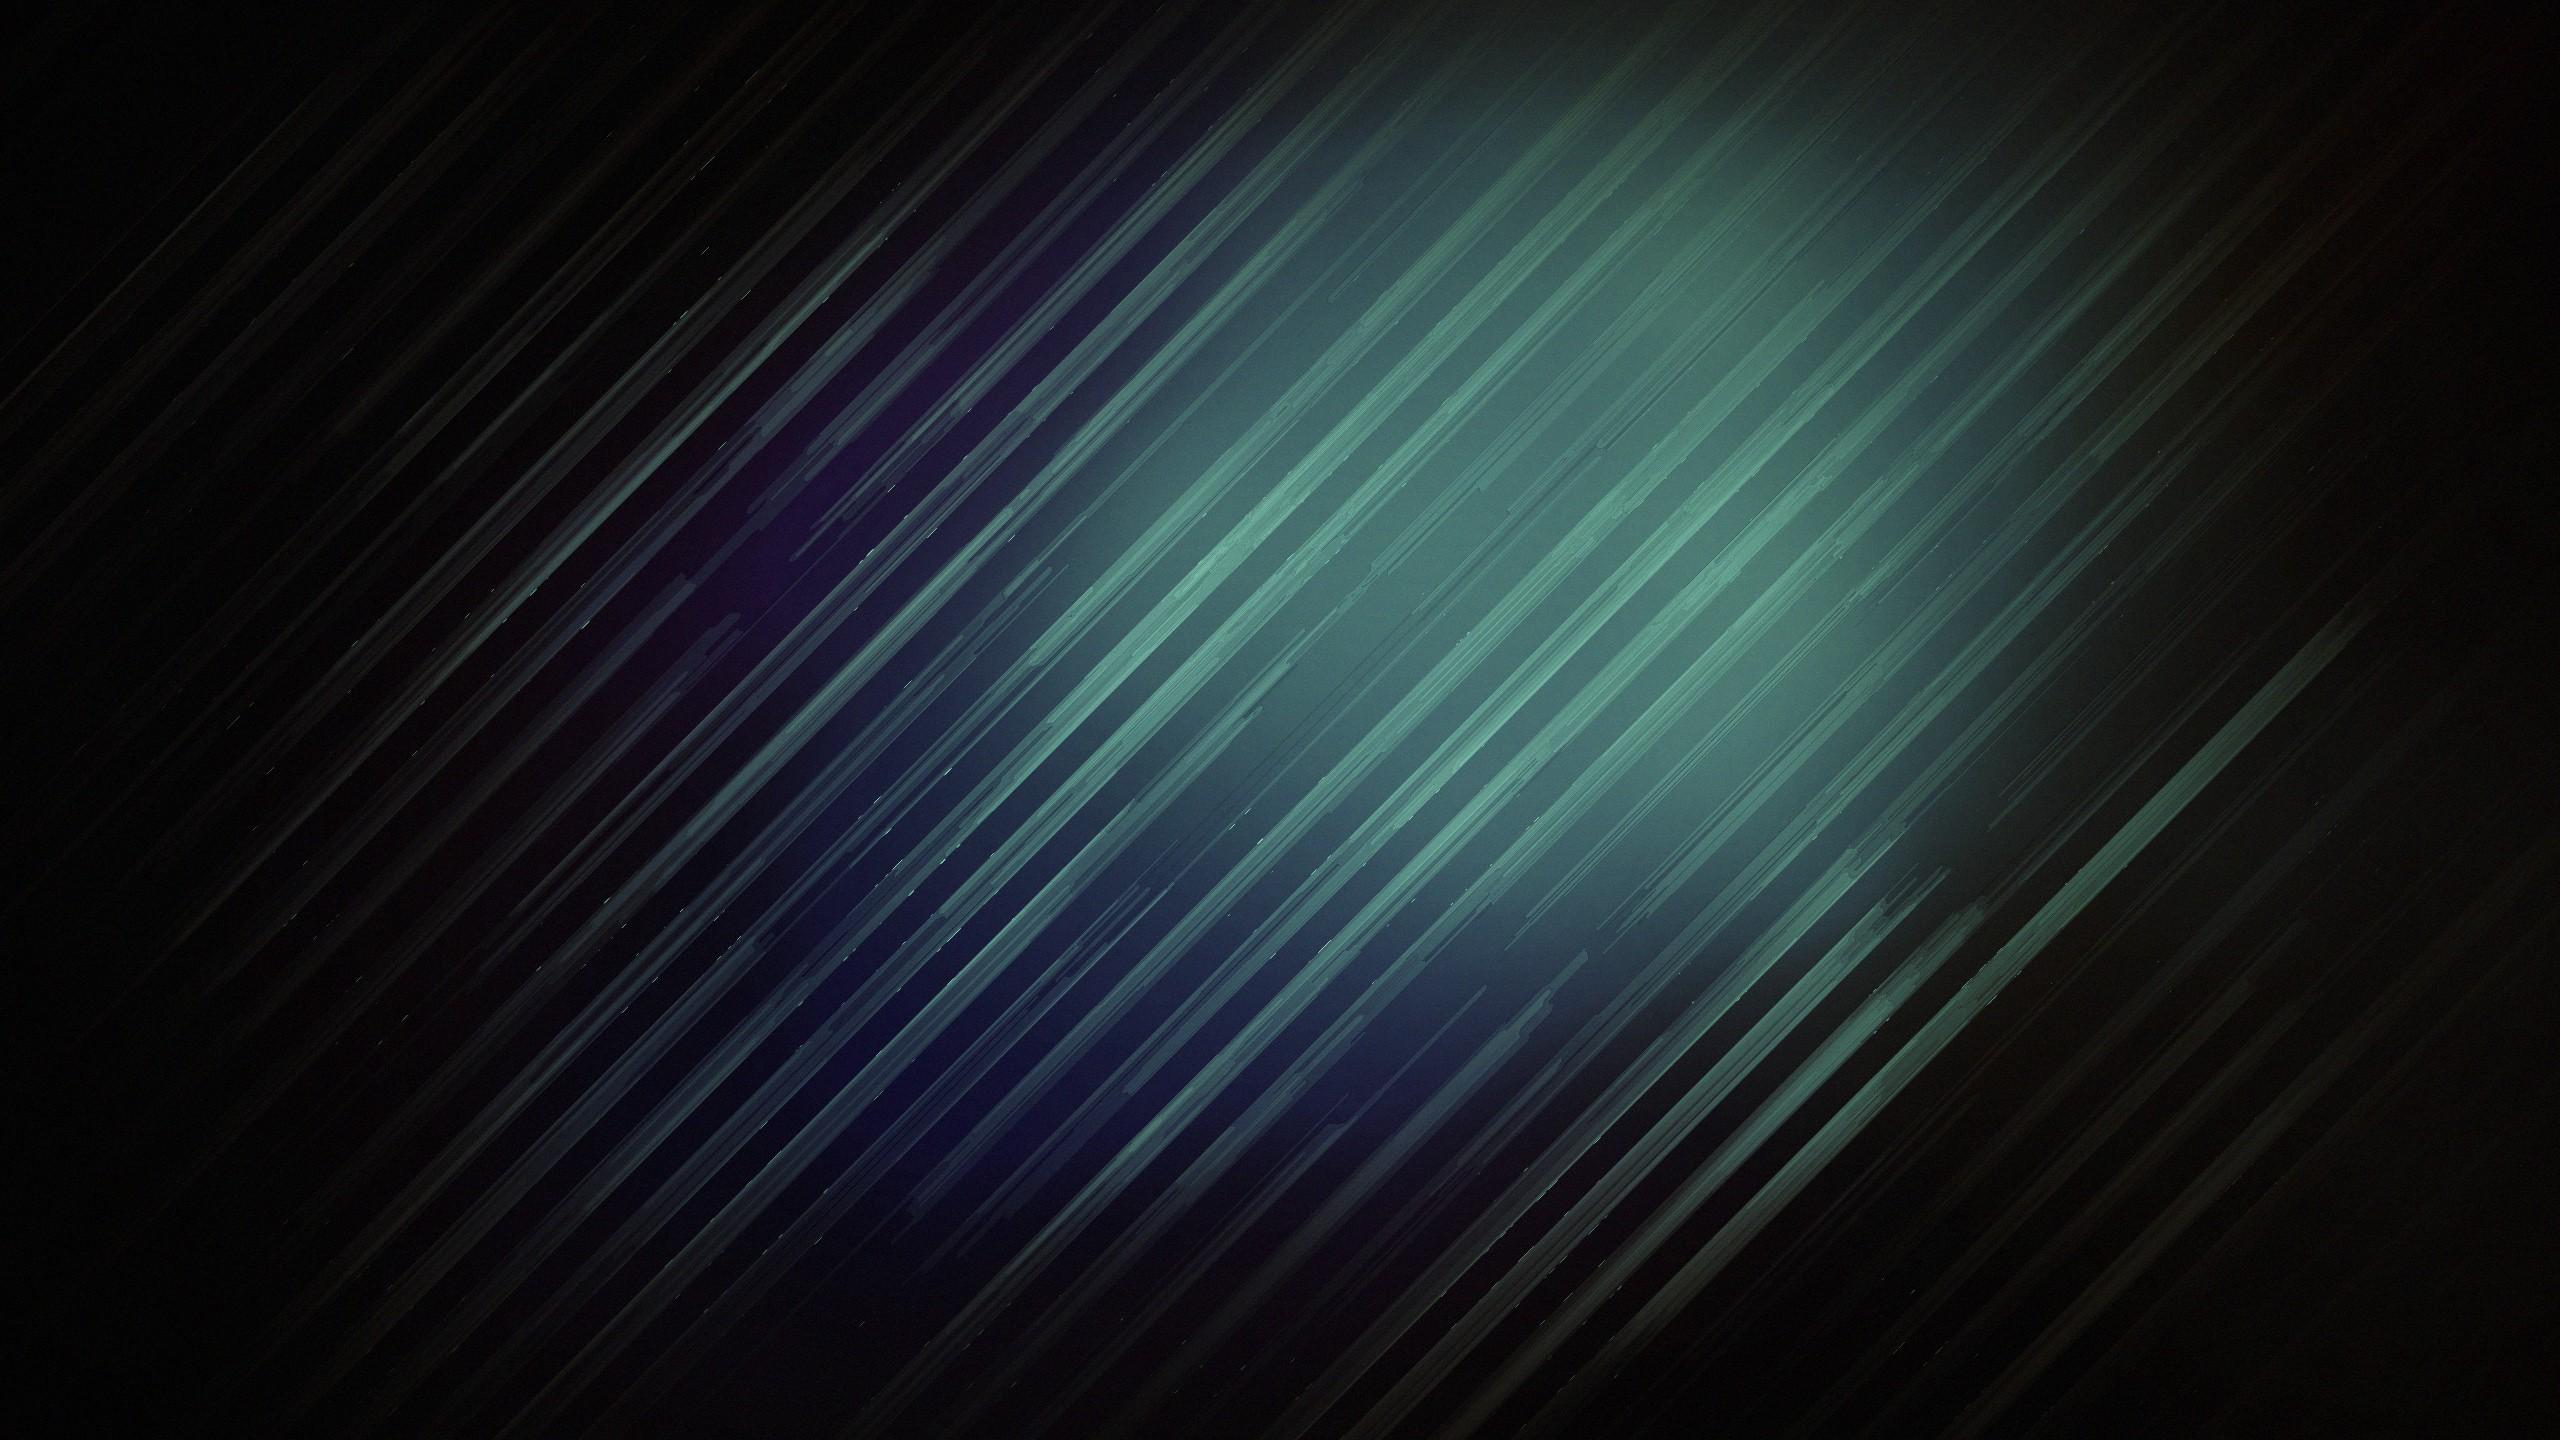 striped wallpaper 21852 2560x1440px striped wallpaper 21852 2560x1440px